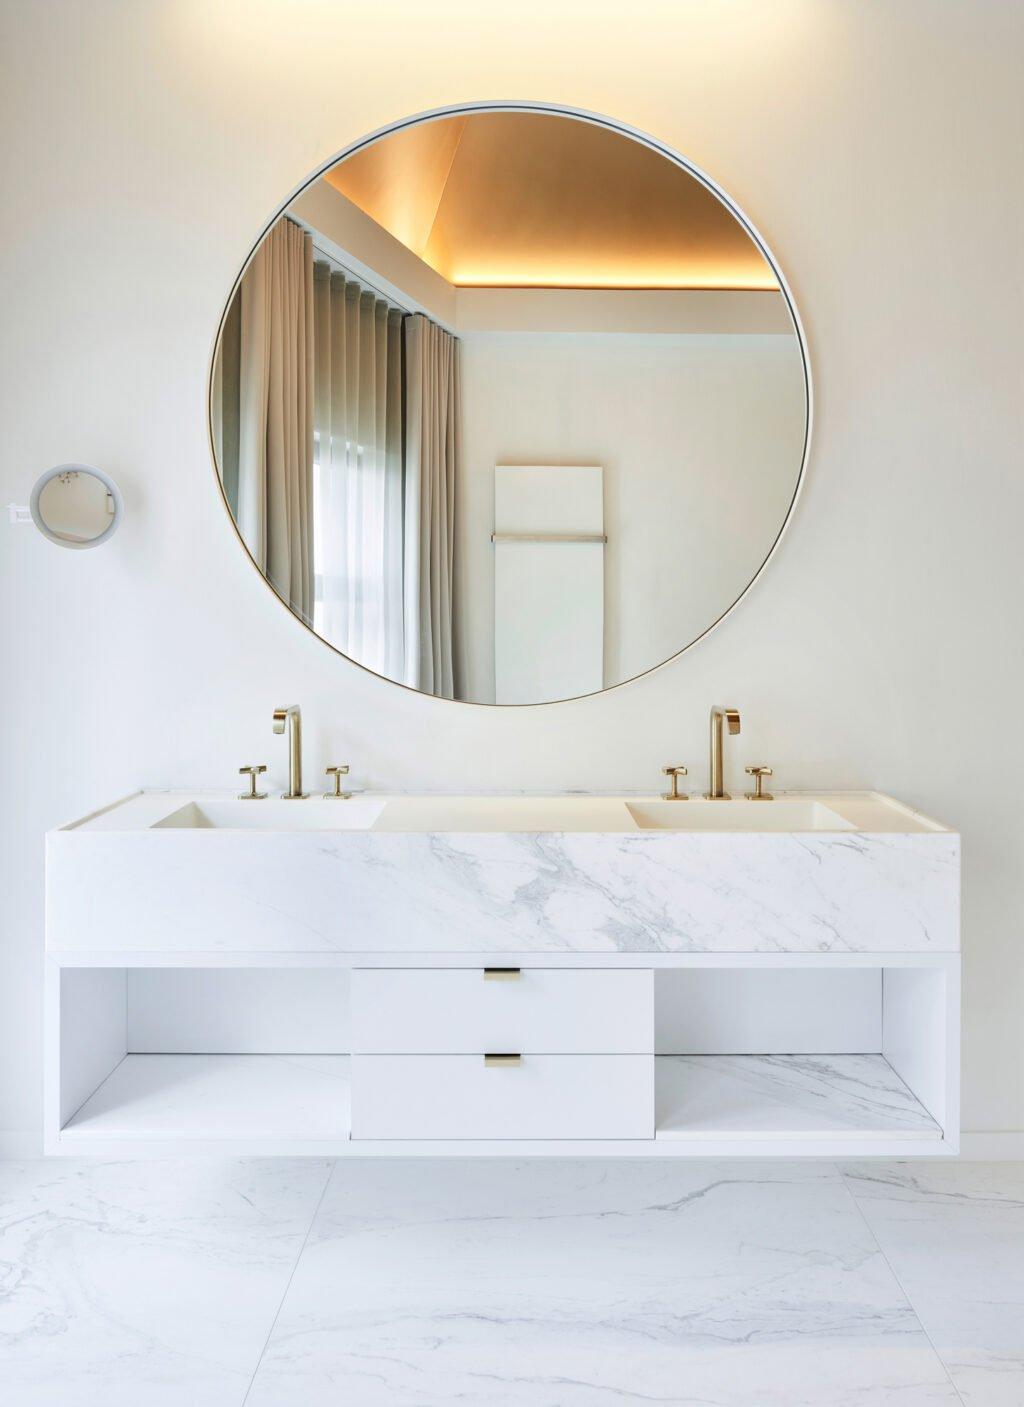 interior design bright bathroom marble white gold details big mirror